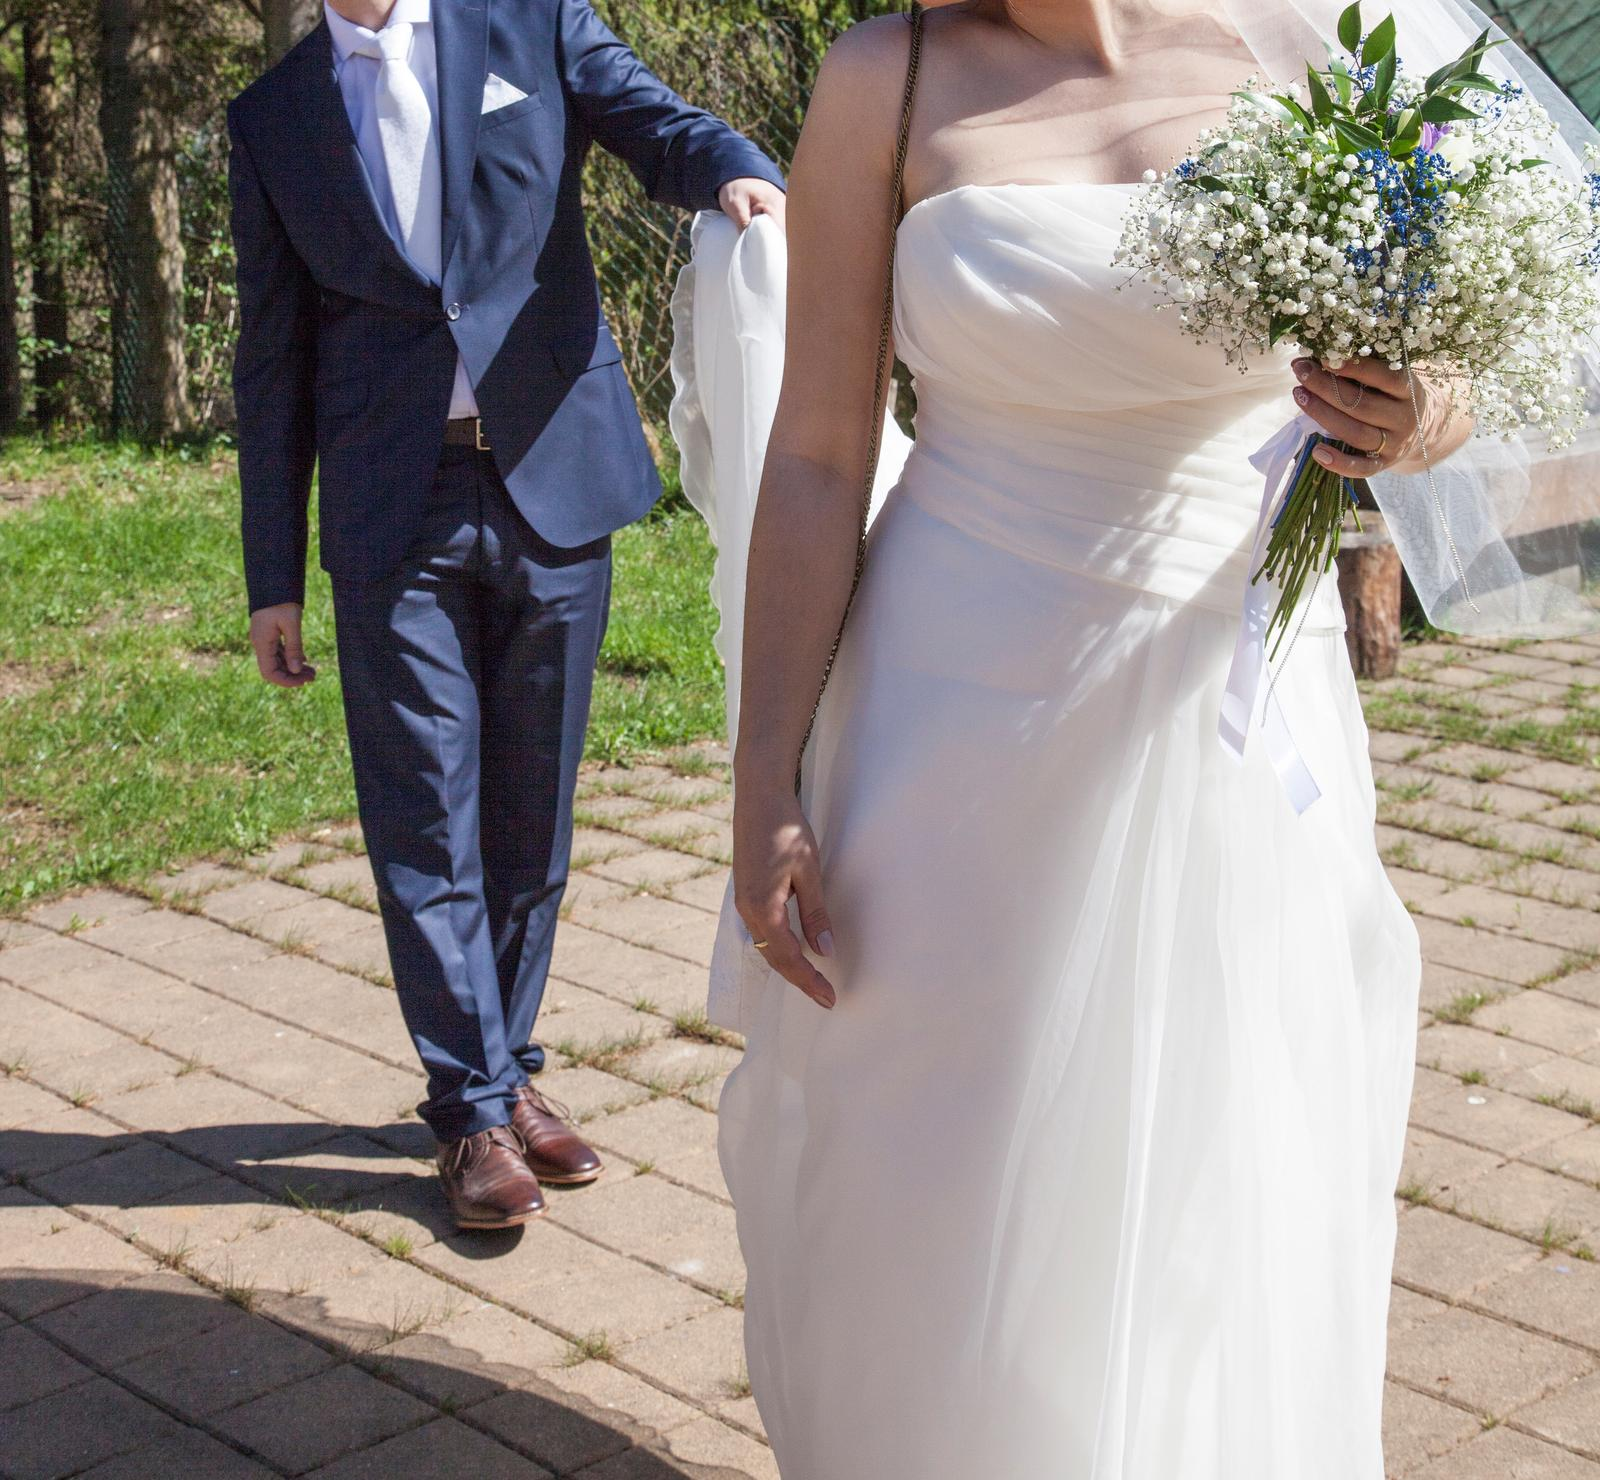 Ivory svadobné šaty - Obrázok č. 2